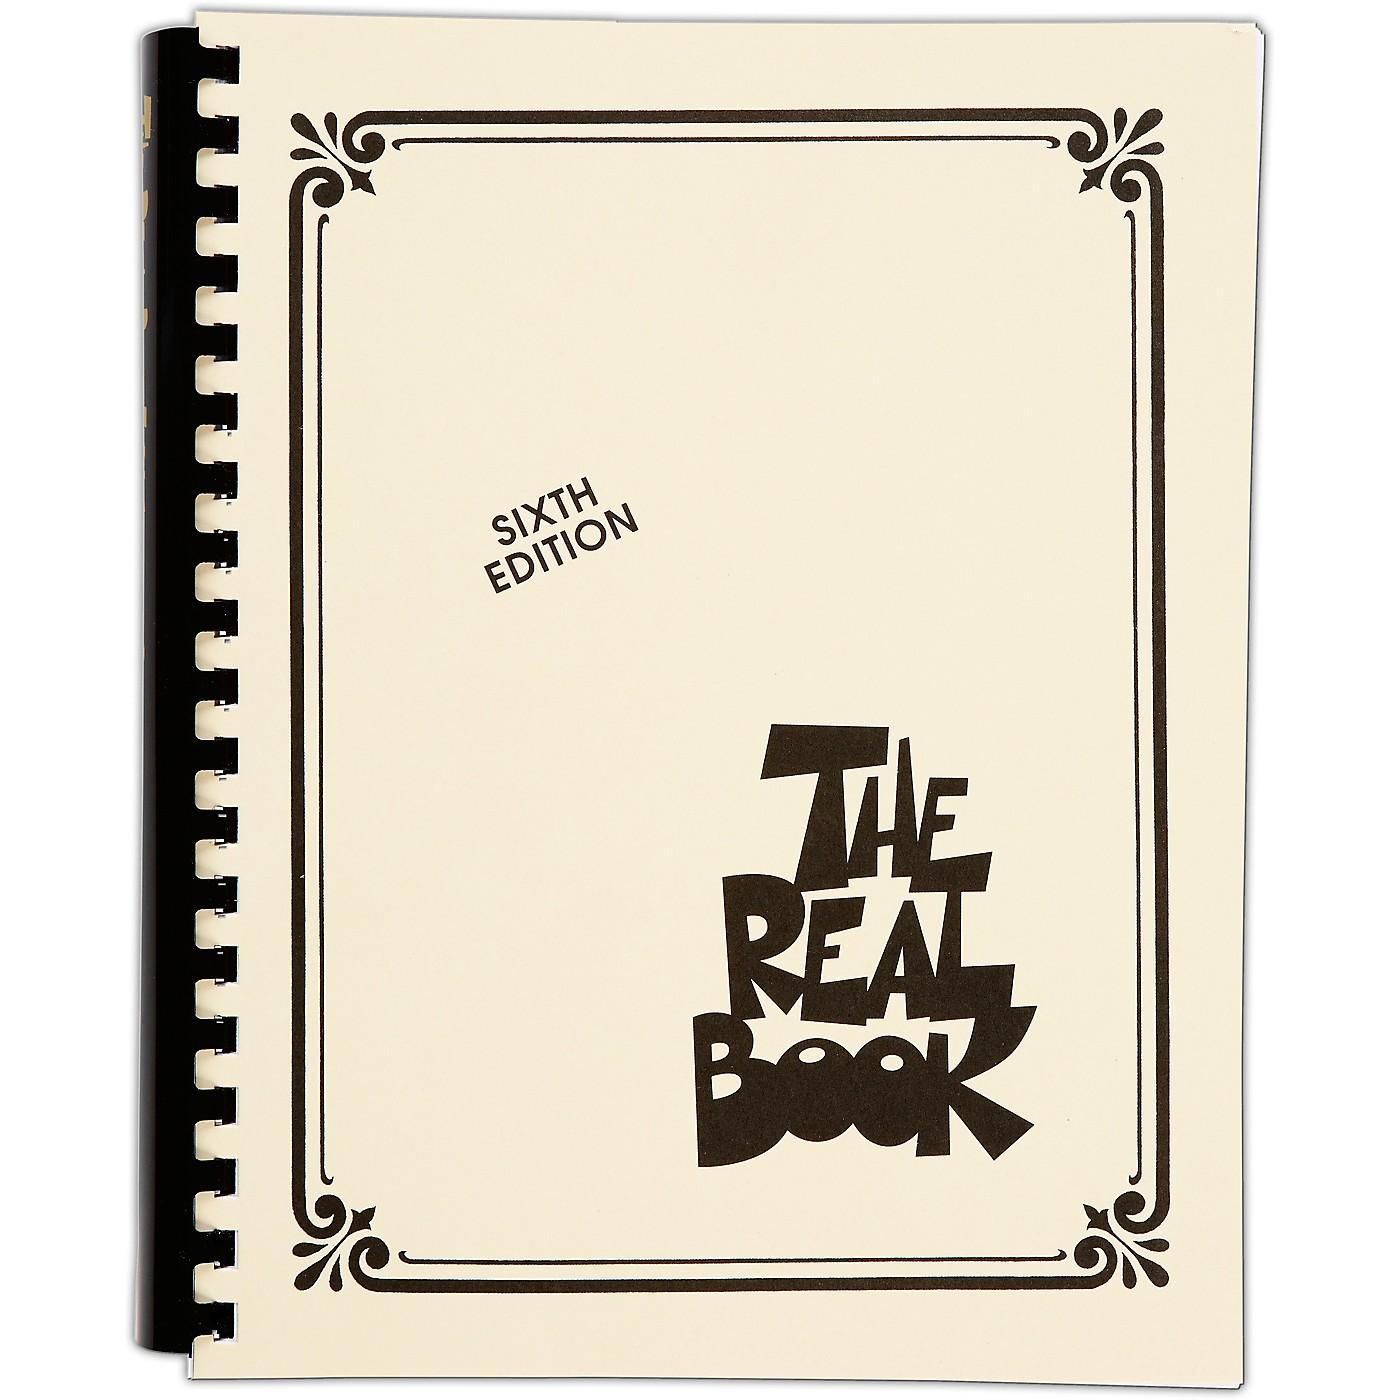 Hal Leonard The Real Book, Sixth Edition - C Instruments thumbnail